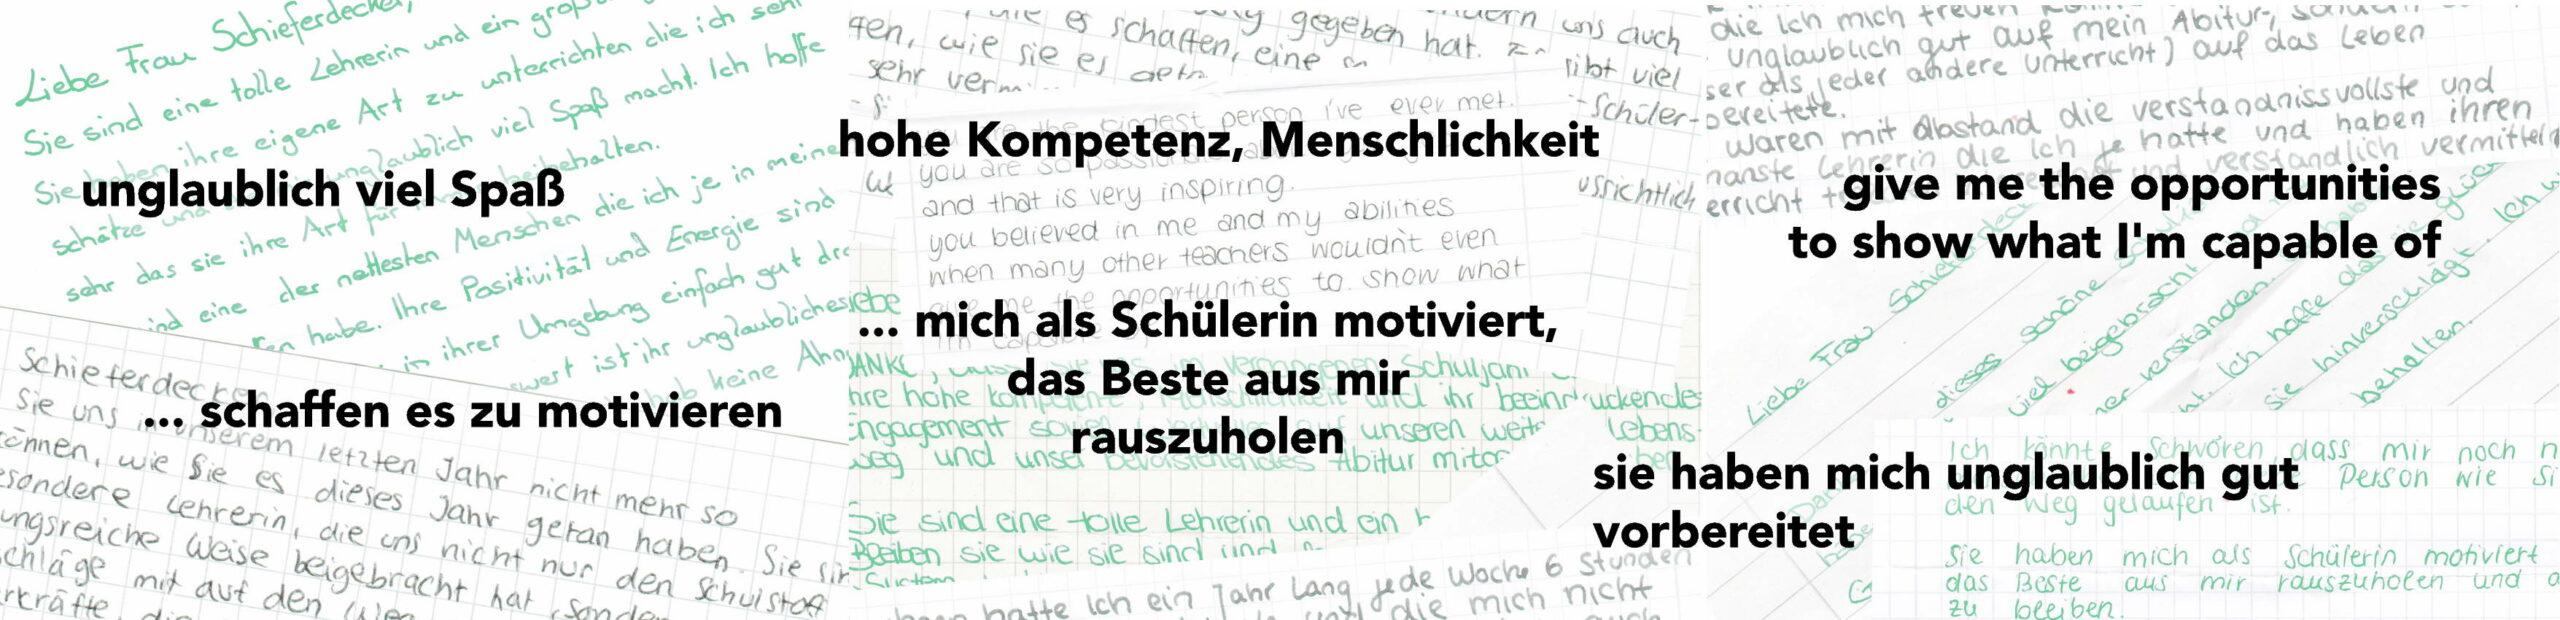 Rueckseite-Flyer_gruen-quer1